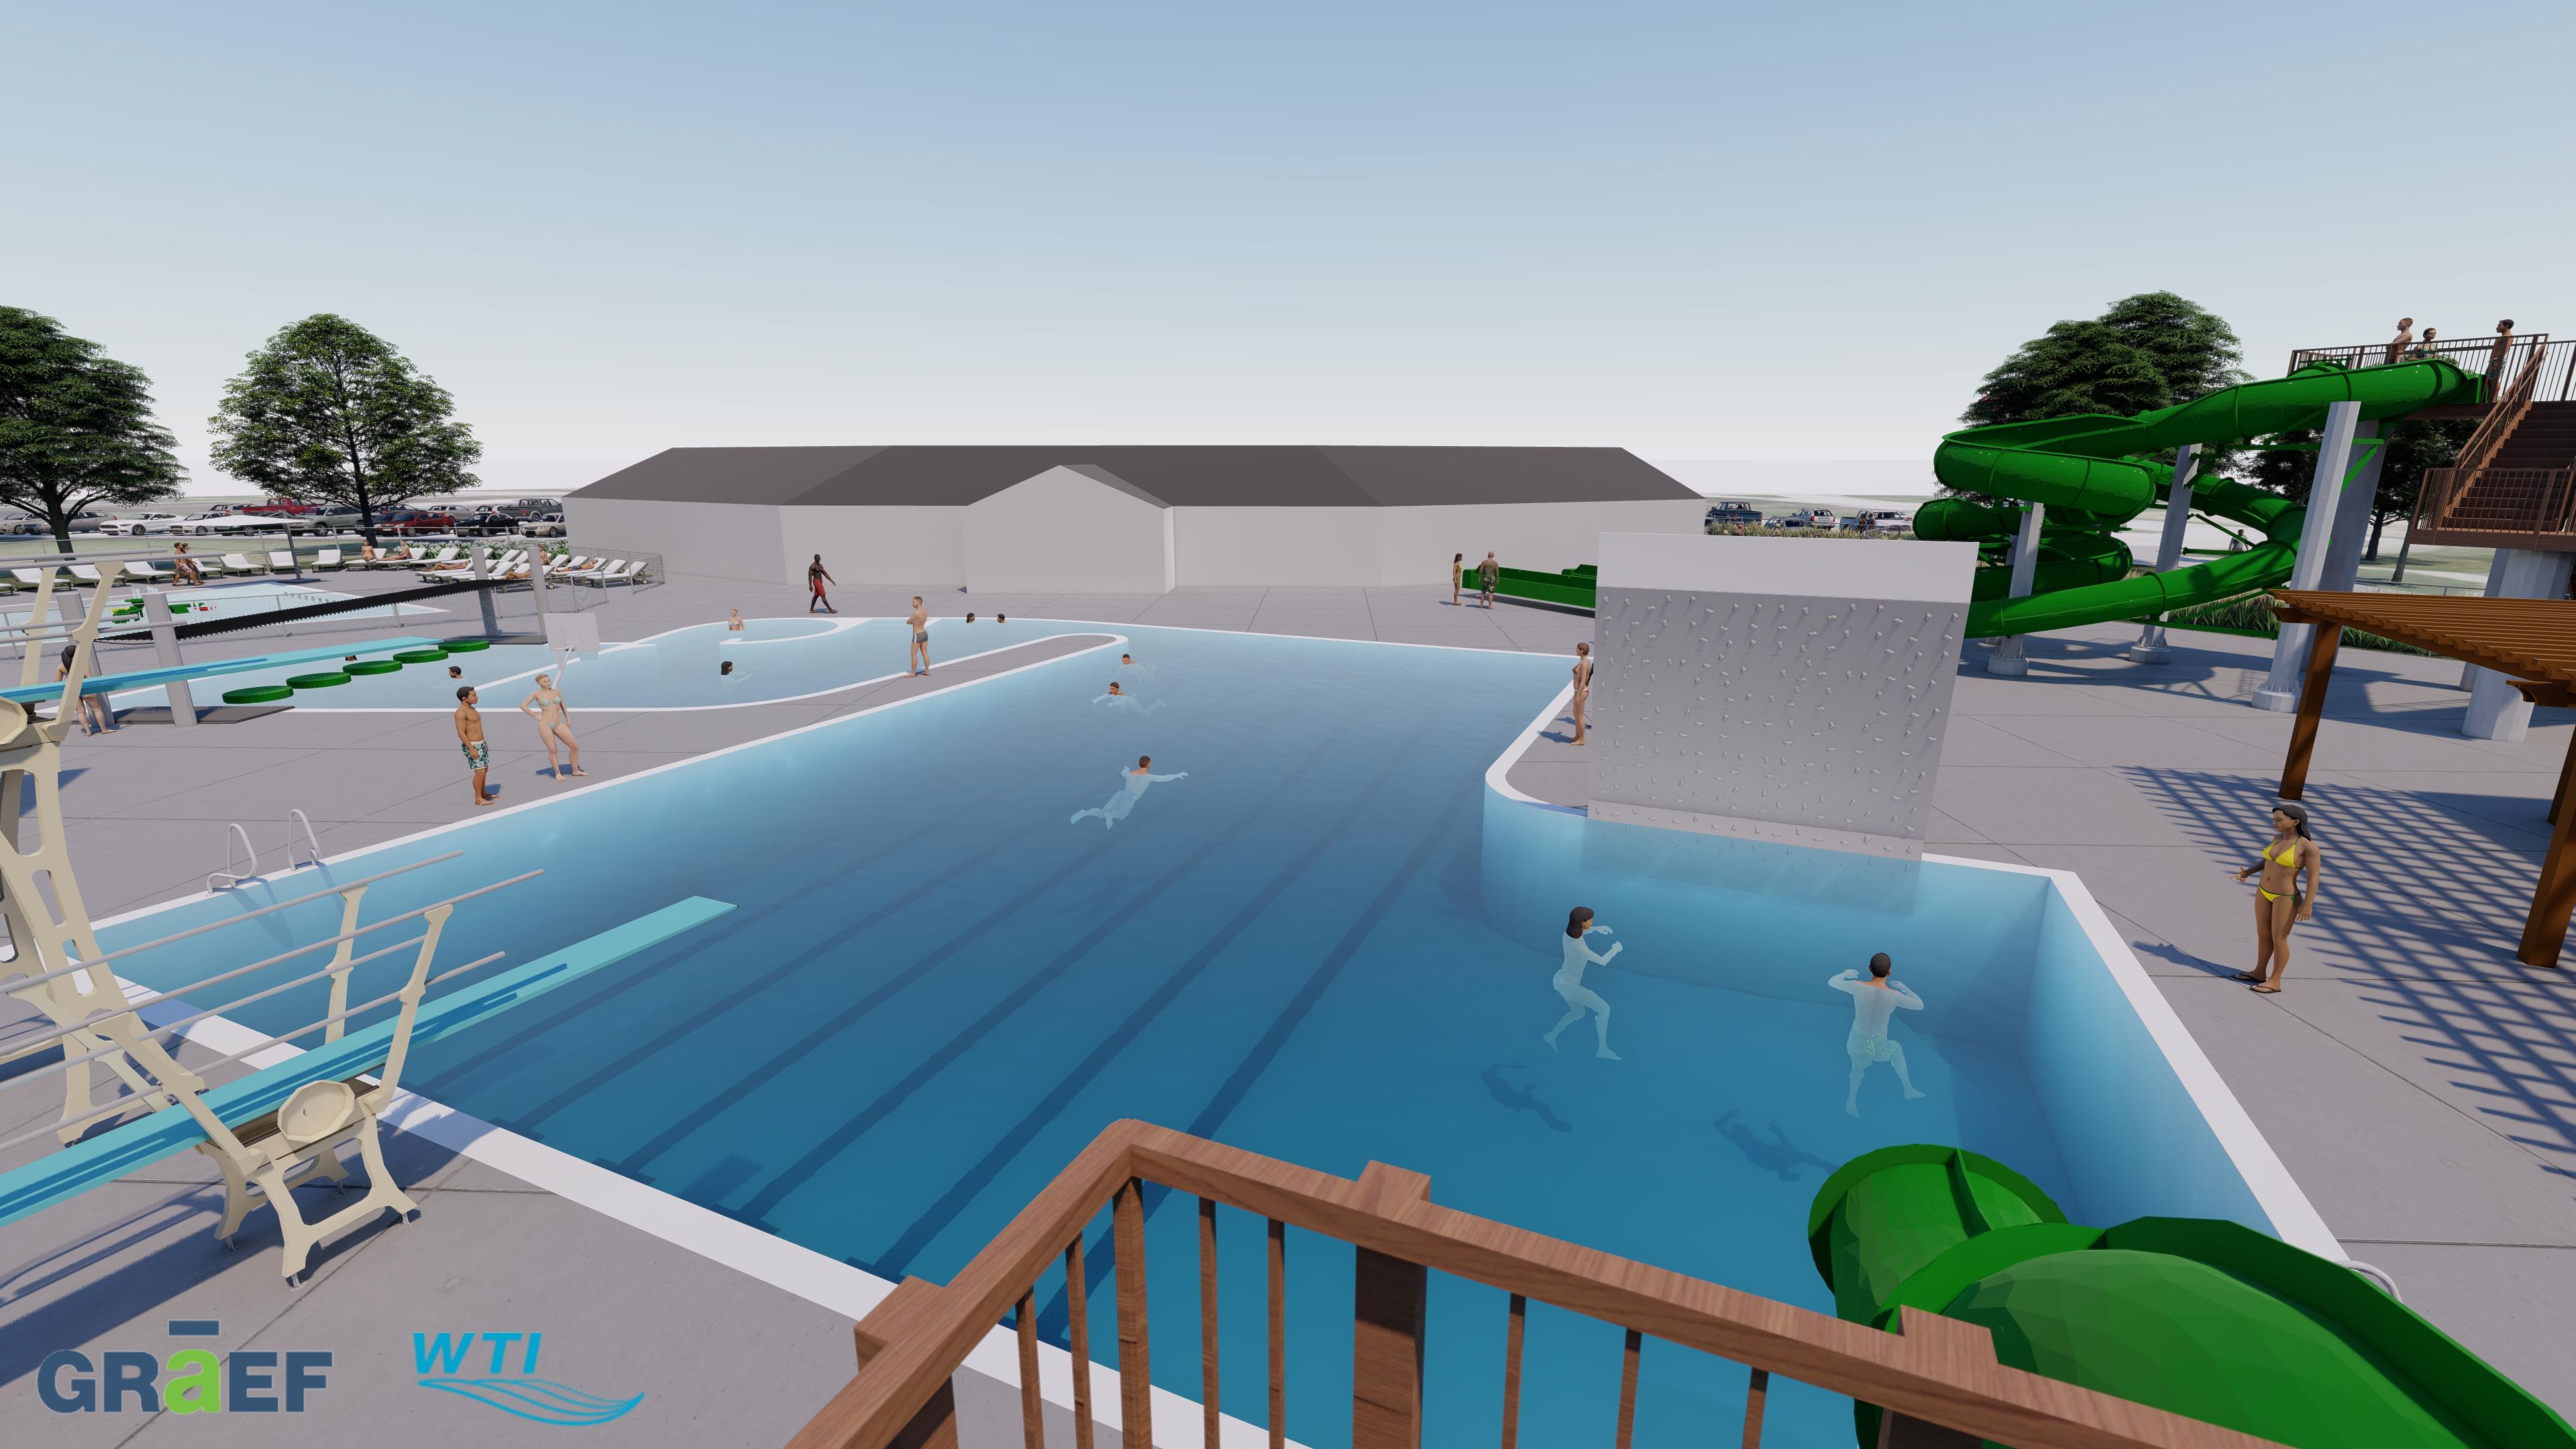 Slideshow Vfw Aquatic Facility Renderings De Pere Wisconsin